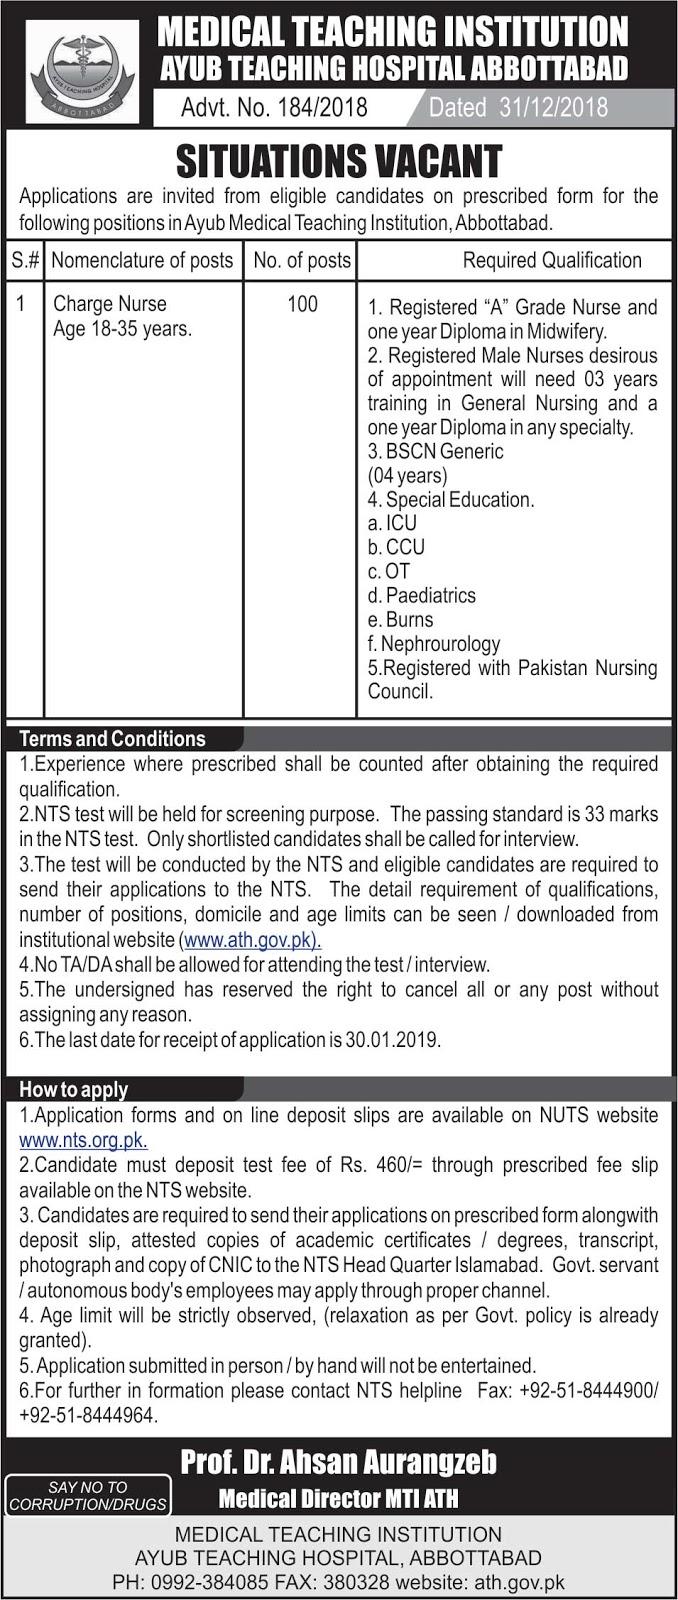 Ayub Teaching Hospital Abbottabad (Screening Test) | NTS jobs | KPK